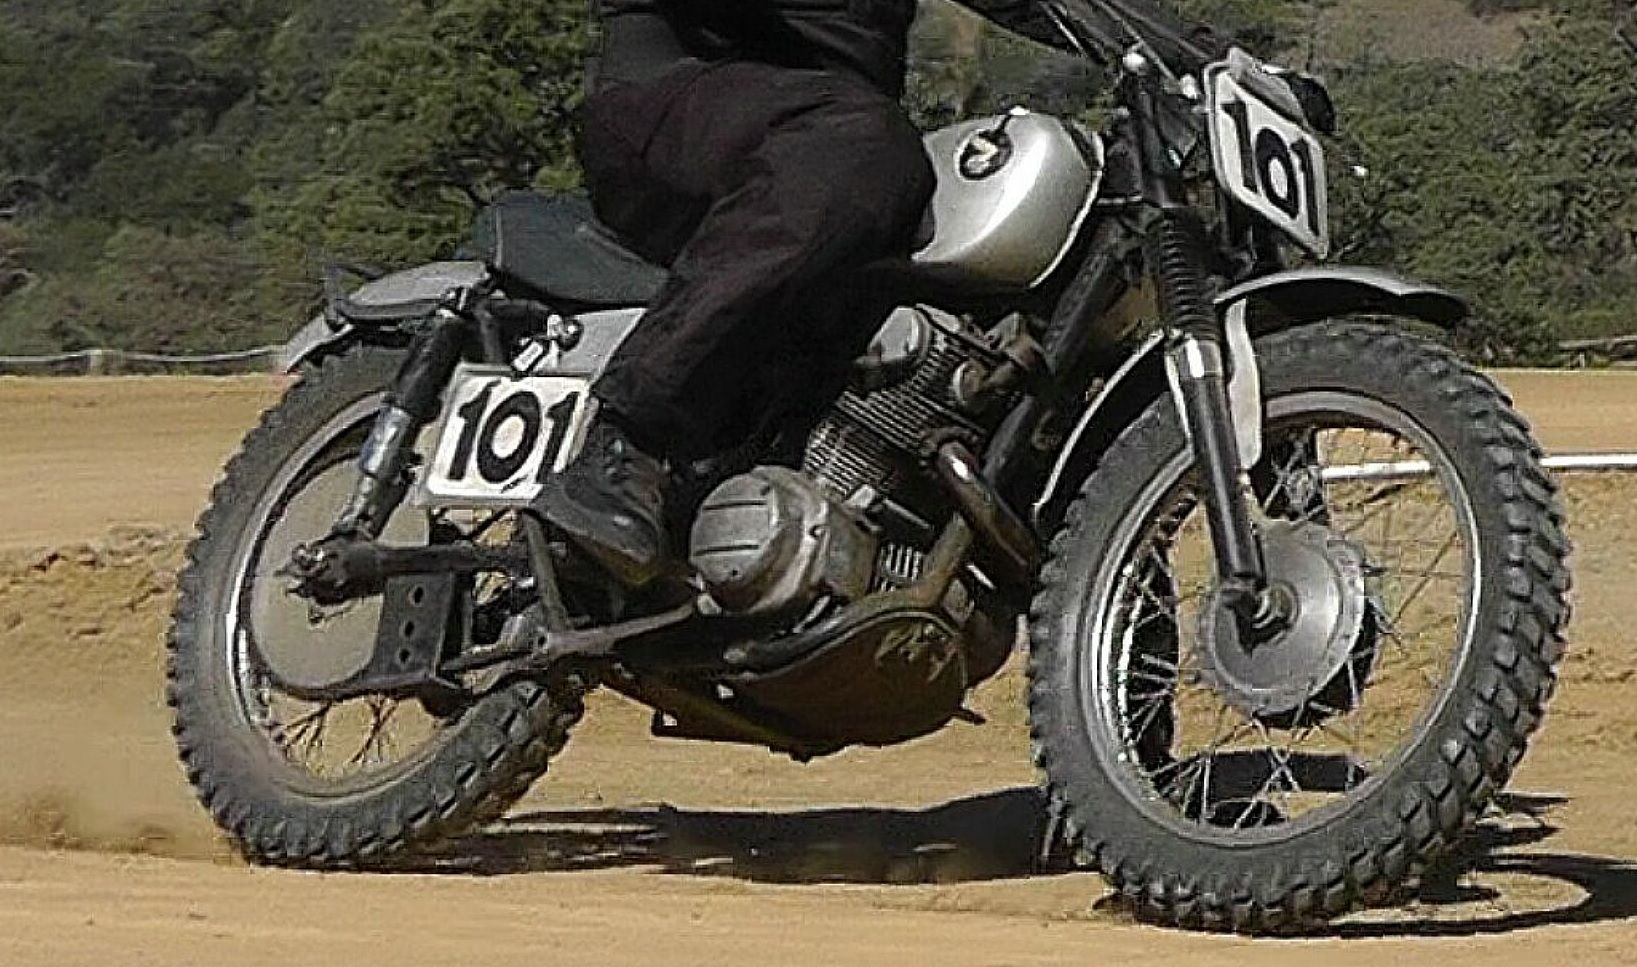 1965 Honda 305 Cl77 Race Scrambler Classic Bikes Honda Scrambler Honda [ 967 x 1637 Pixel ]